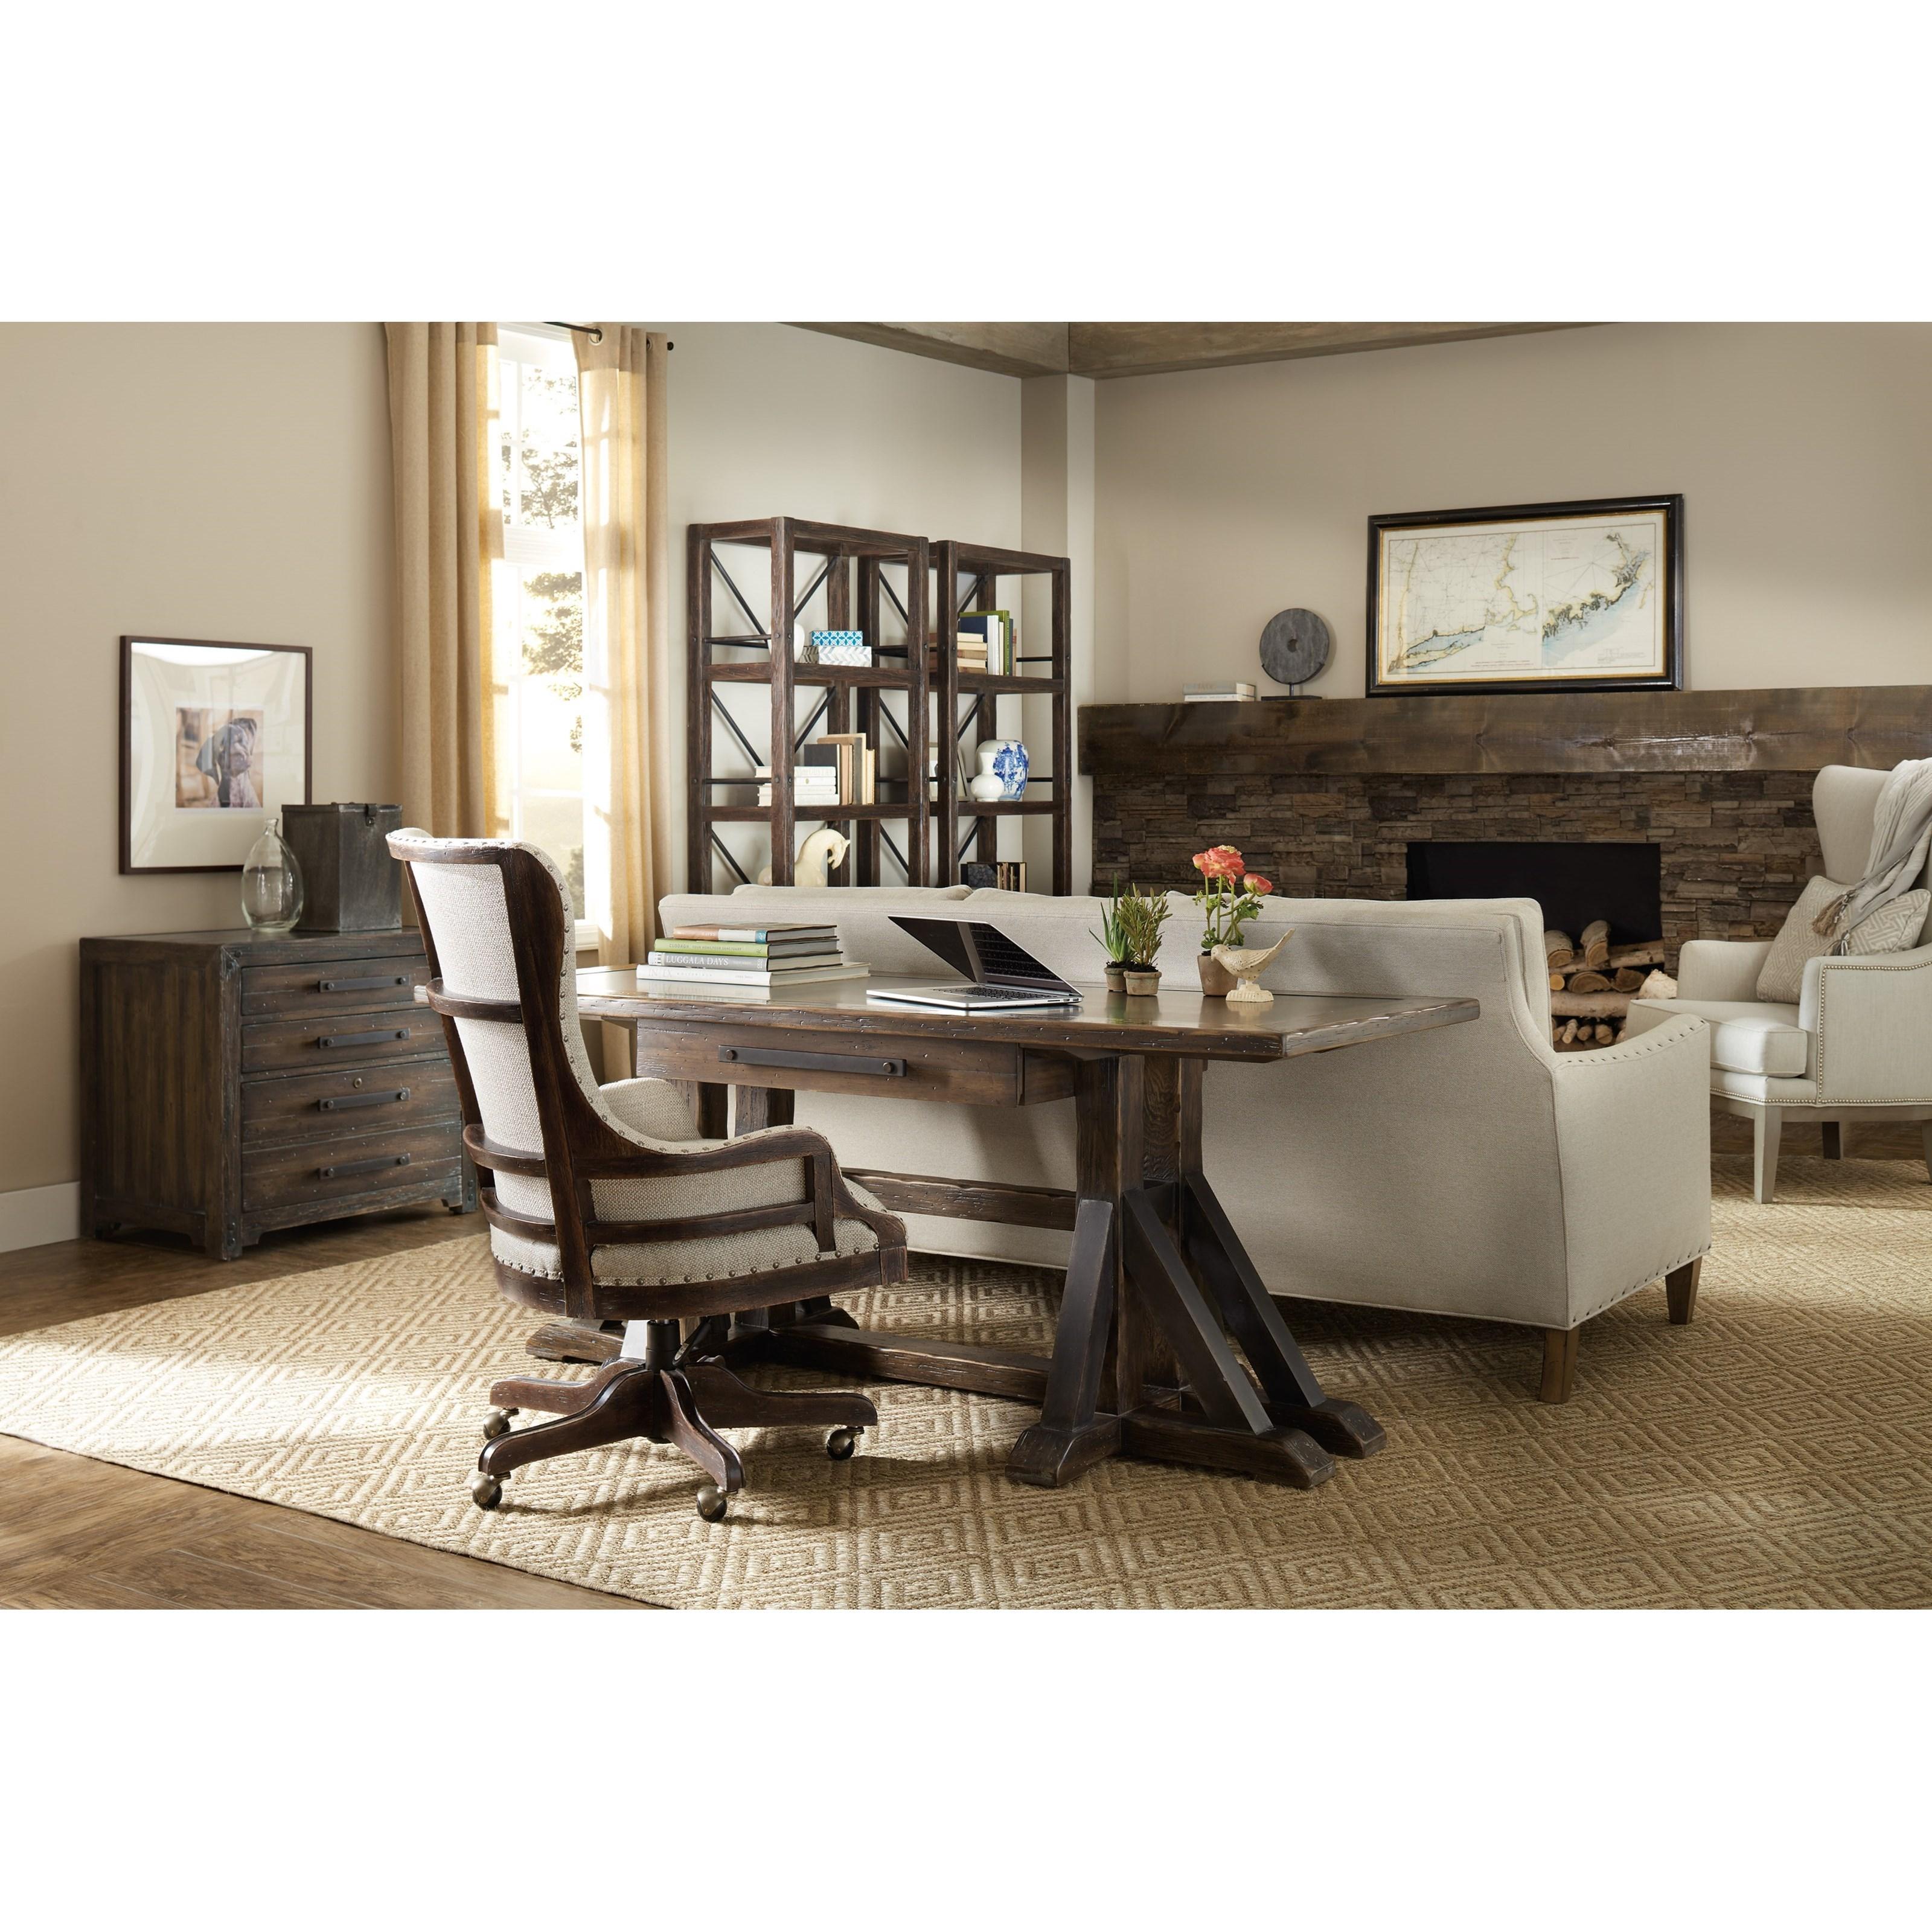 Hooker furniture american life roslyn county for American lifestyle furniture